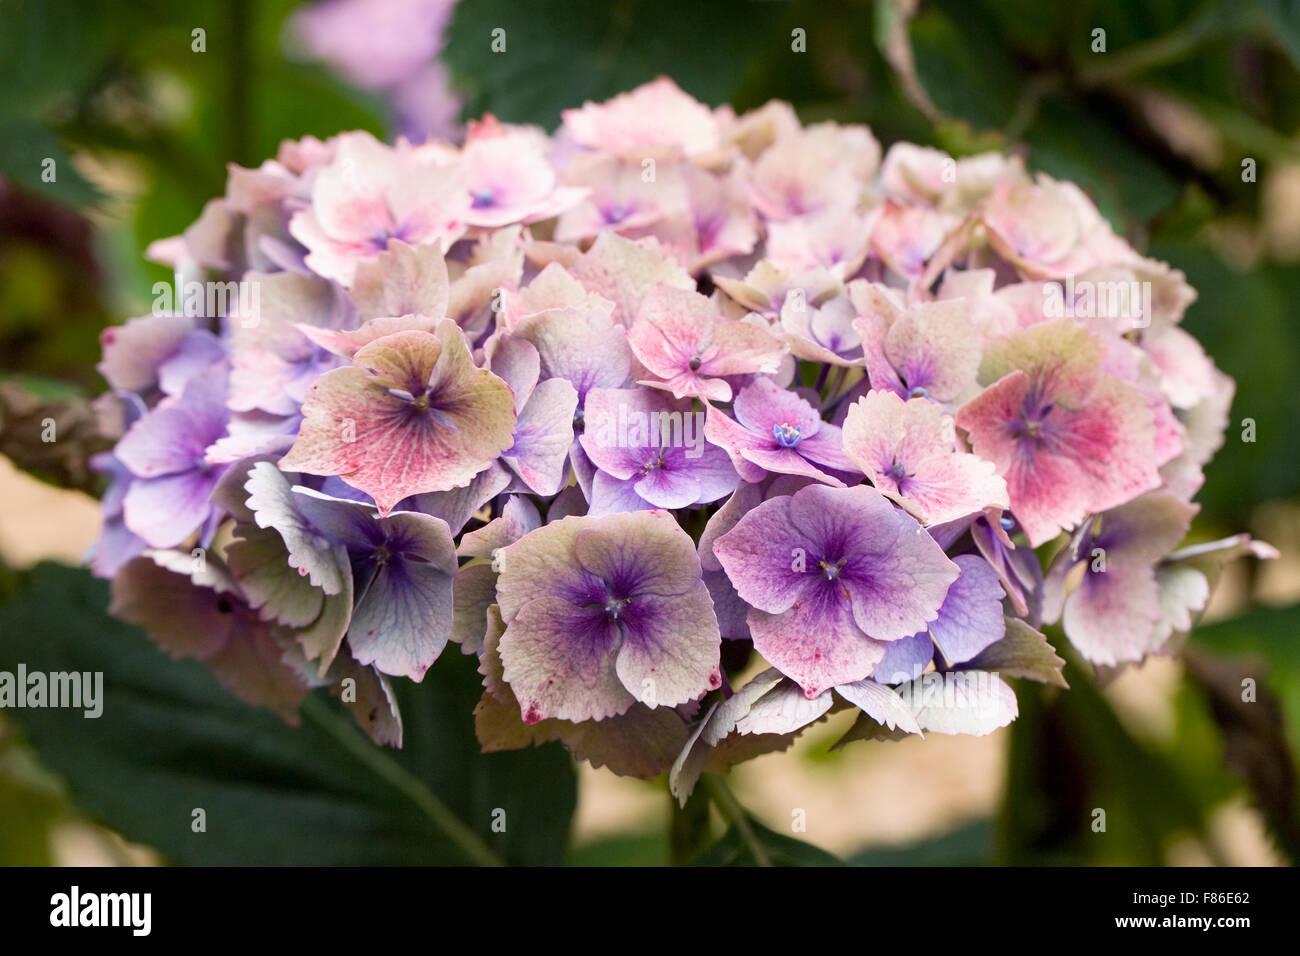 Hydrangea macrophylla Hamburg 'Raham' flowers in late summer. - Stock Image